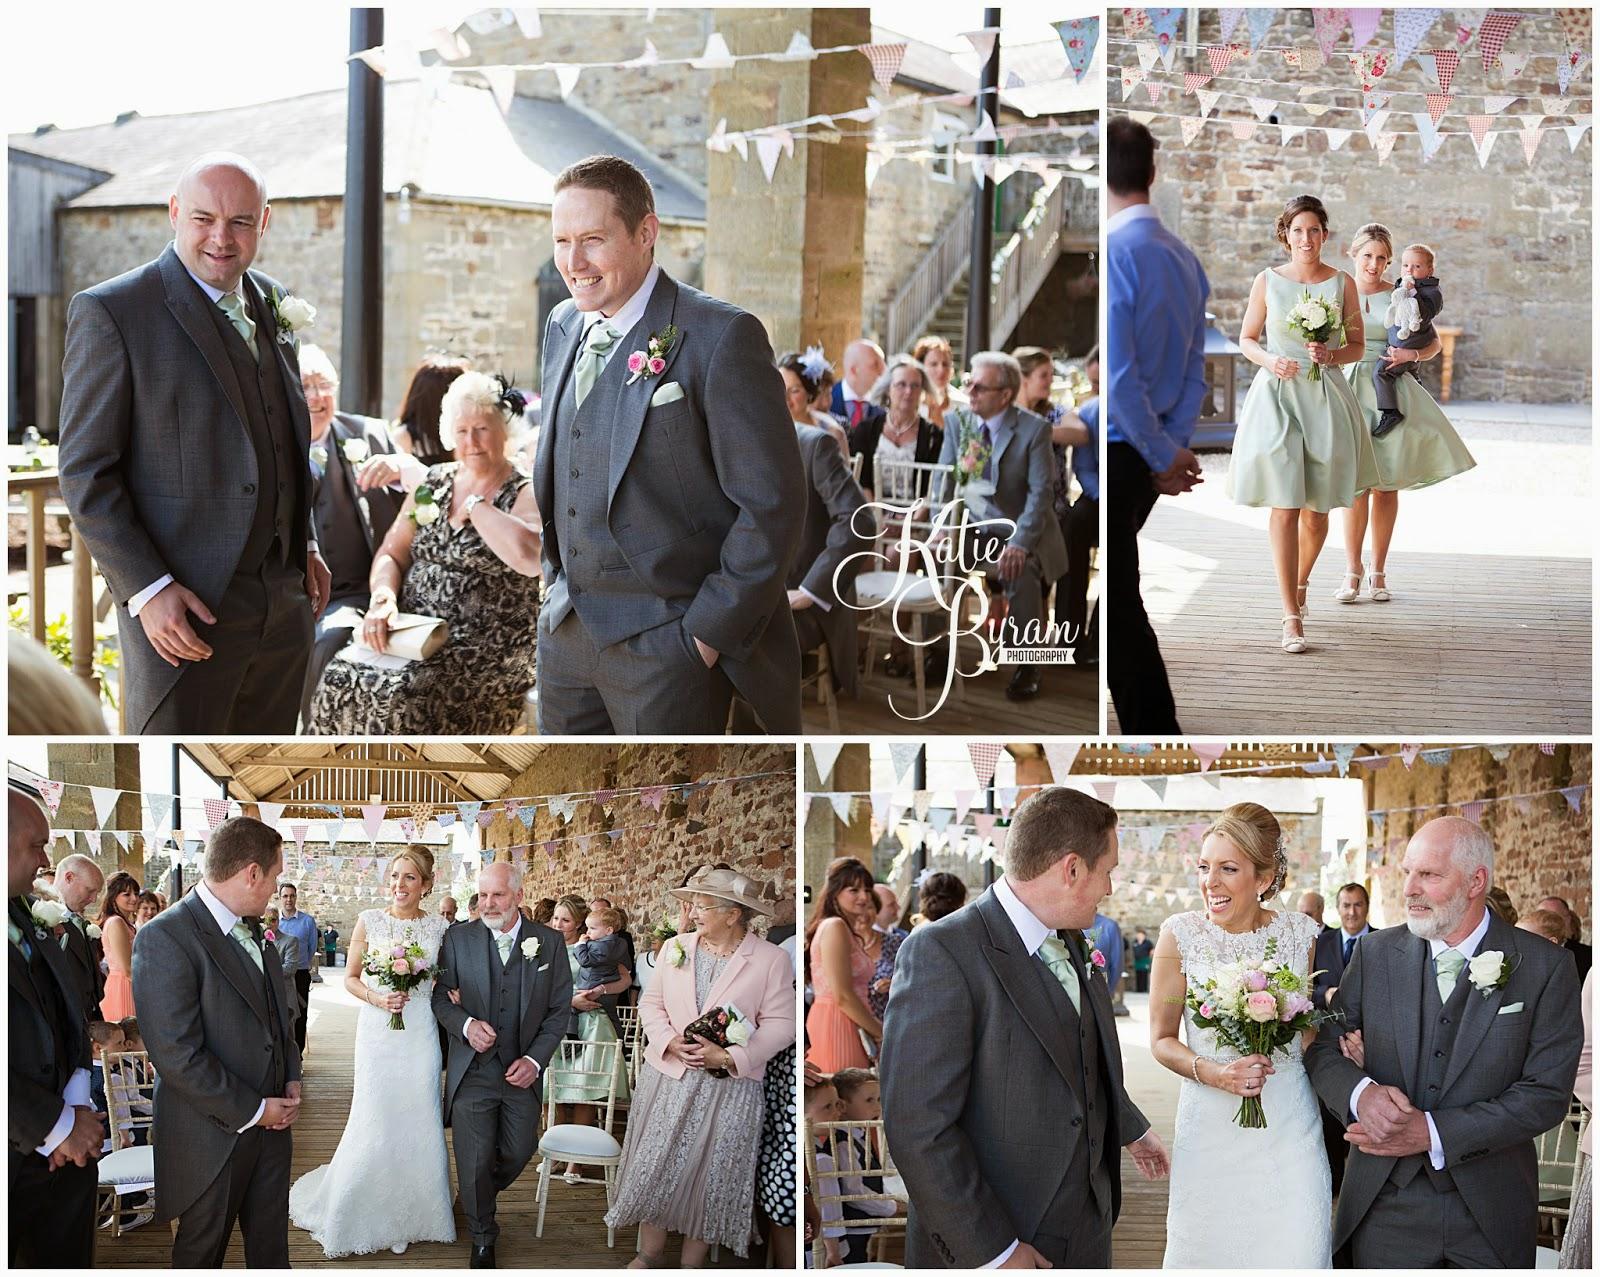 high house farm brewery, healey barn, high house farm wedding, matfen wedding, matfen brewery, quirky wedding venue, northumberland, katie byram photography, hay bales wedding, bride and groom, farm wedding